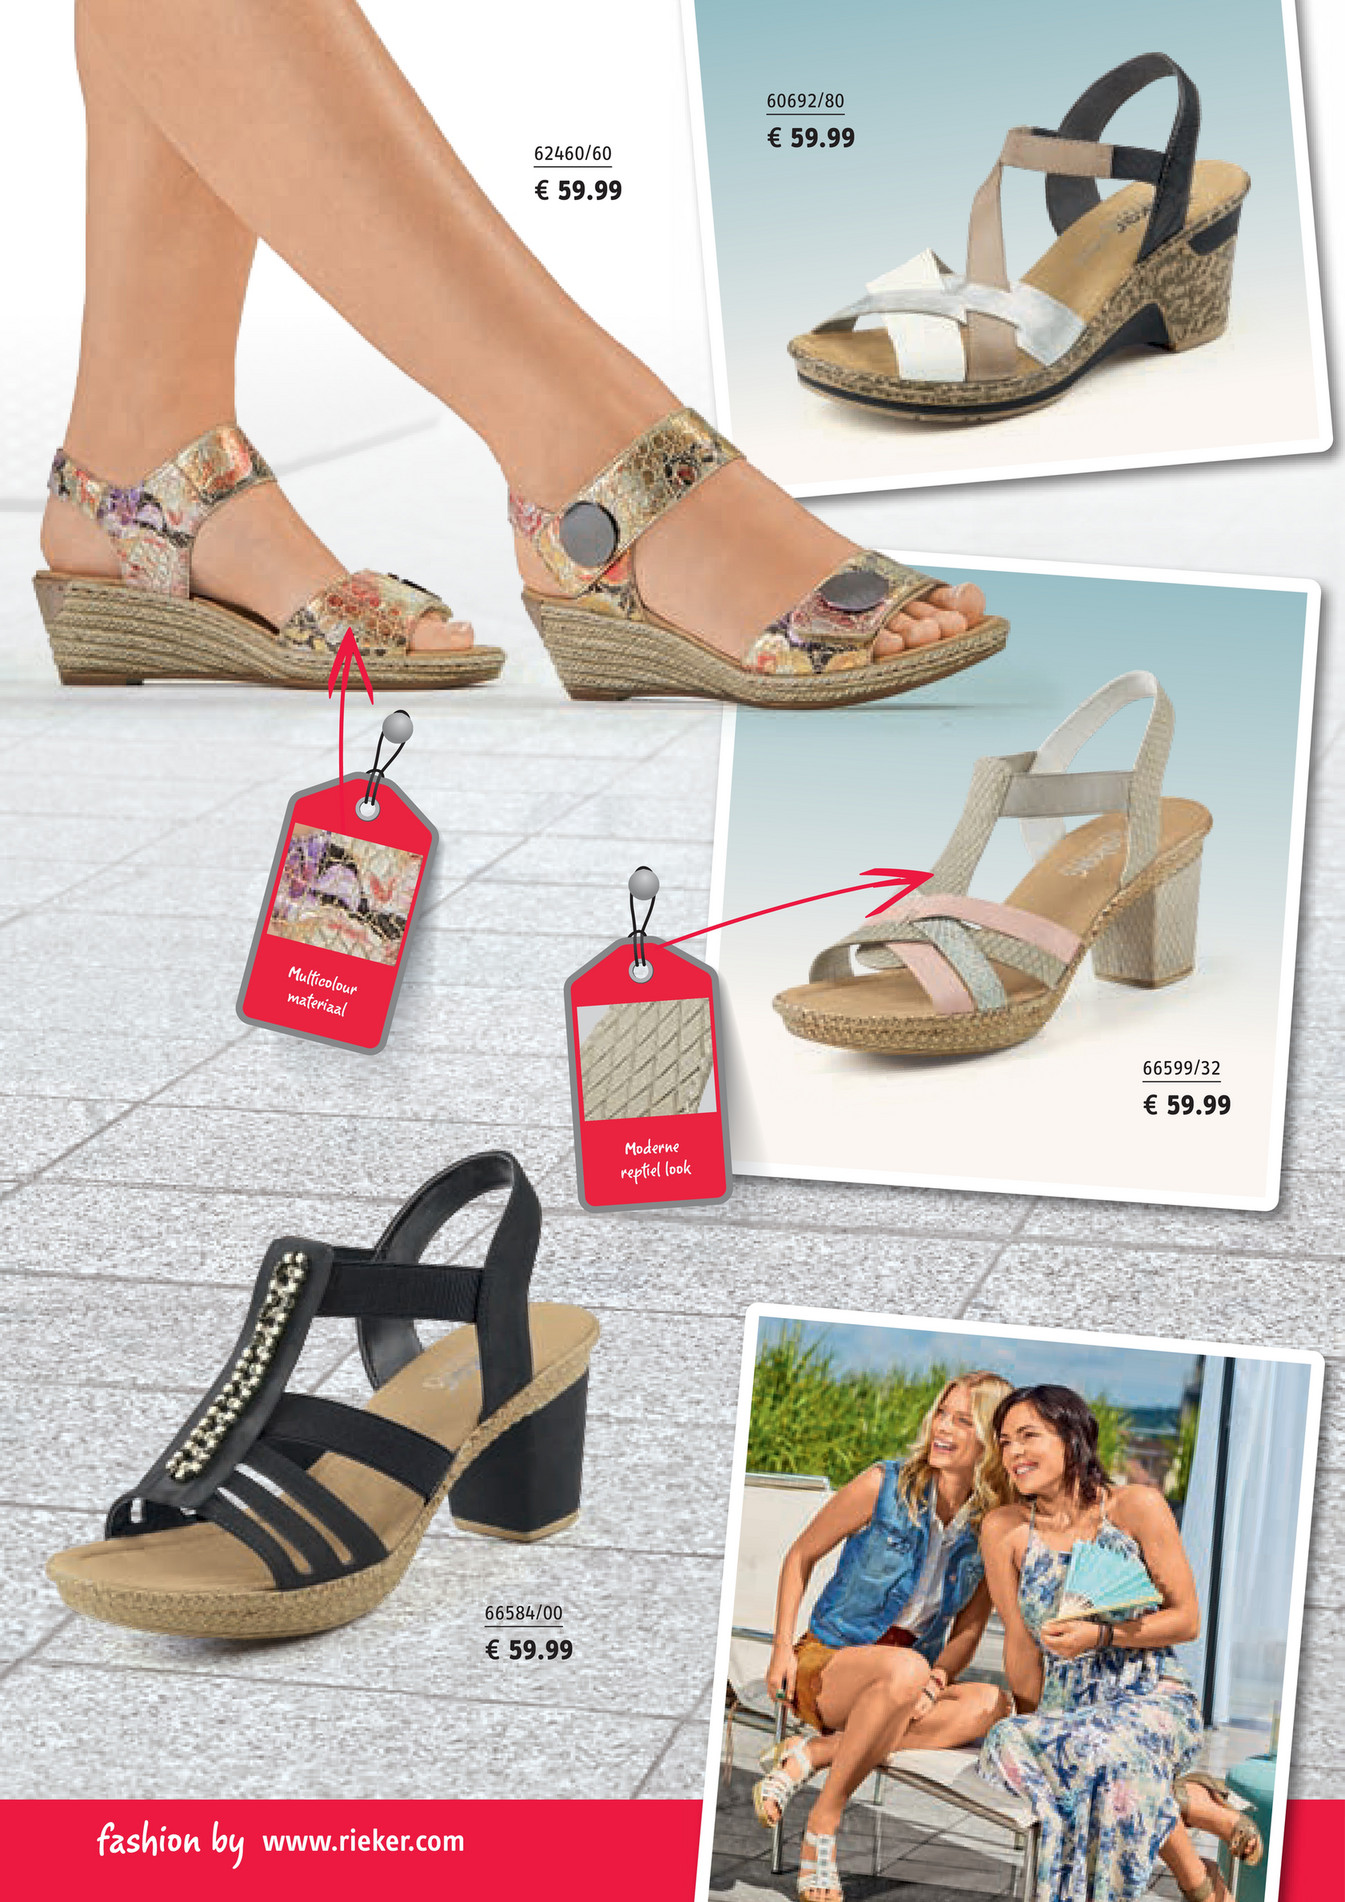 Nelson Schoenen Rieker voorjaarsfolder Rieker sandalen beige